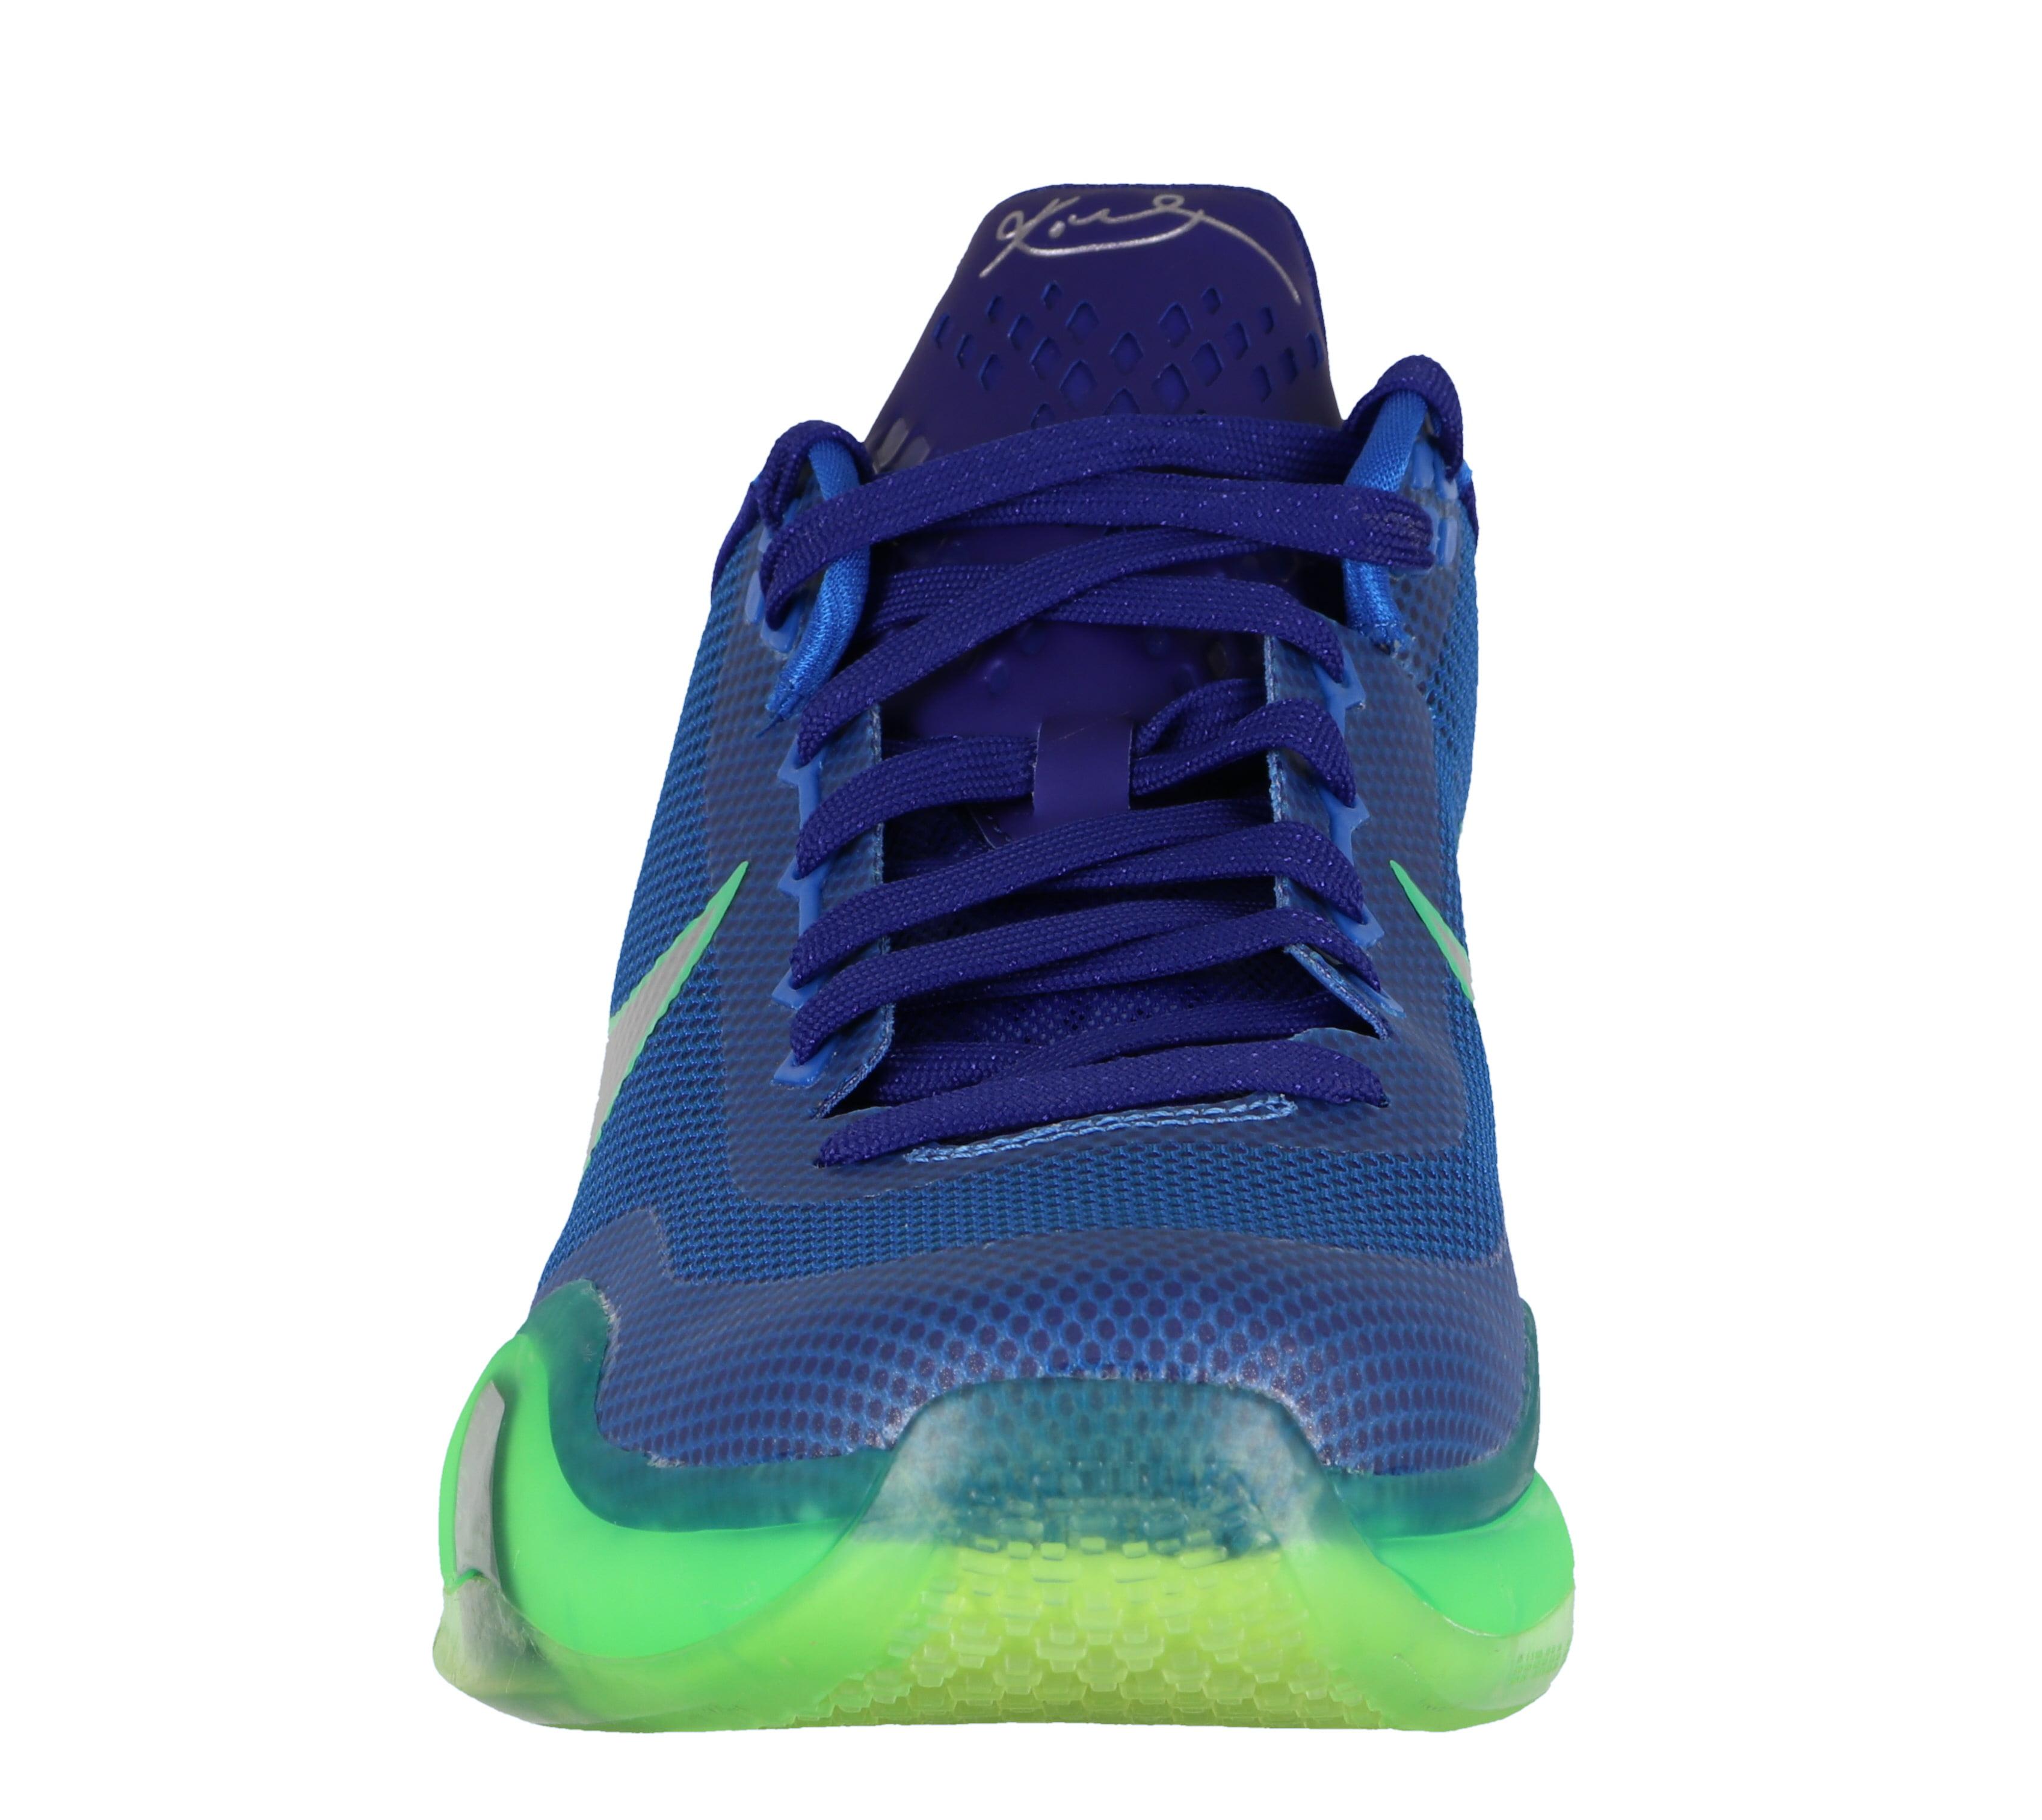 Nike Men's Kobe X Basketball Shoes sz 13 Green Royal Blue Emerald City Seattle Seahawks